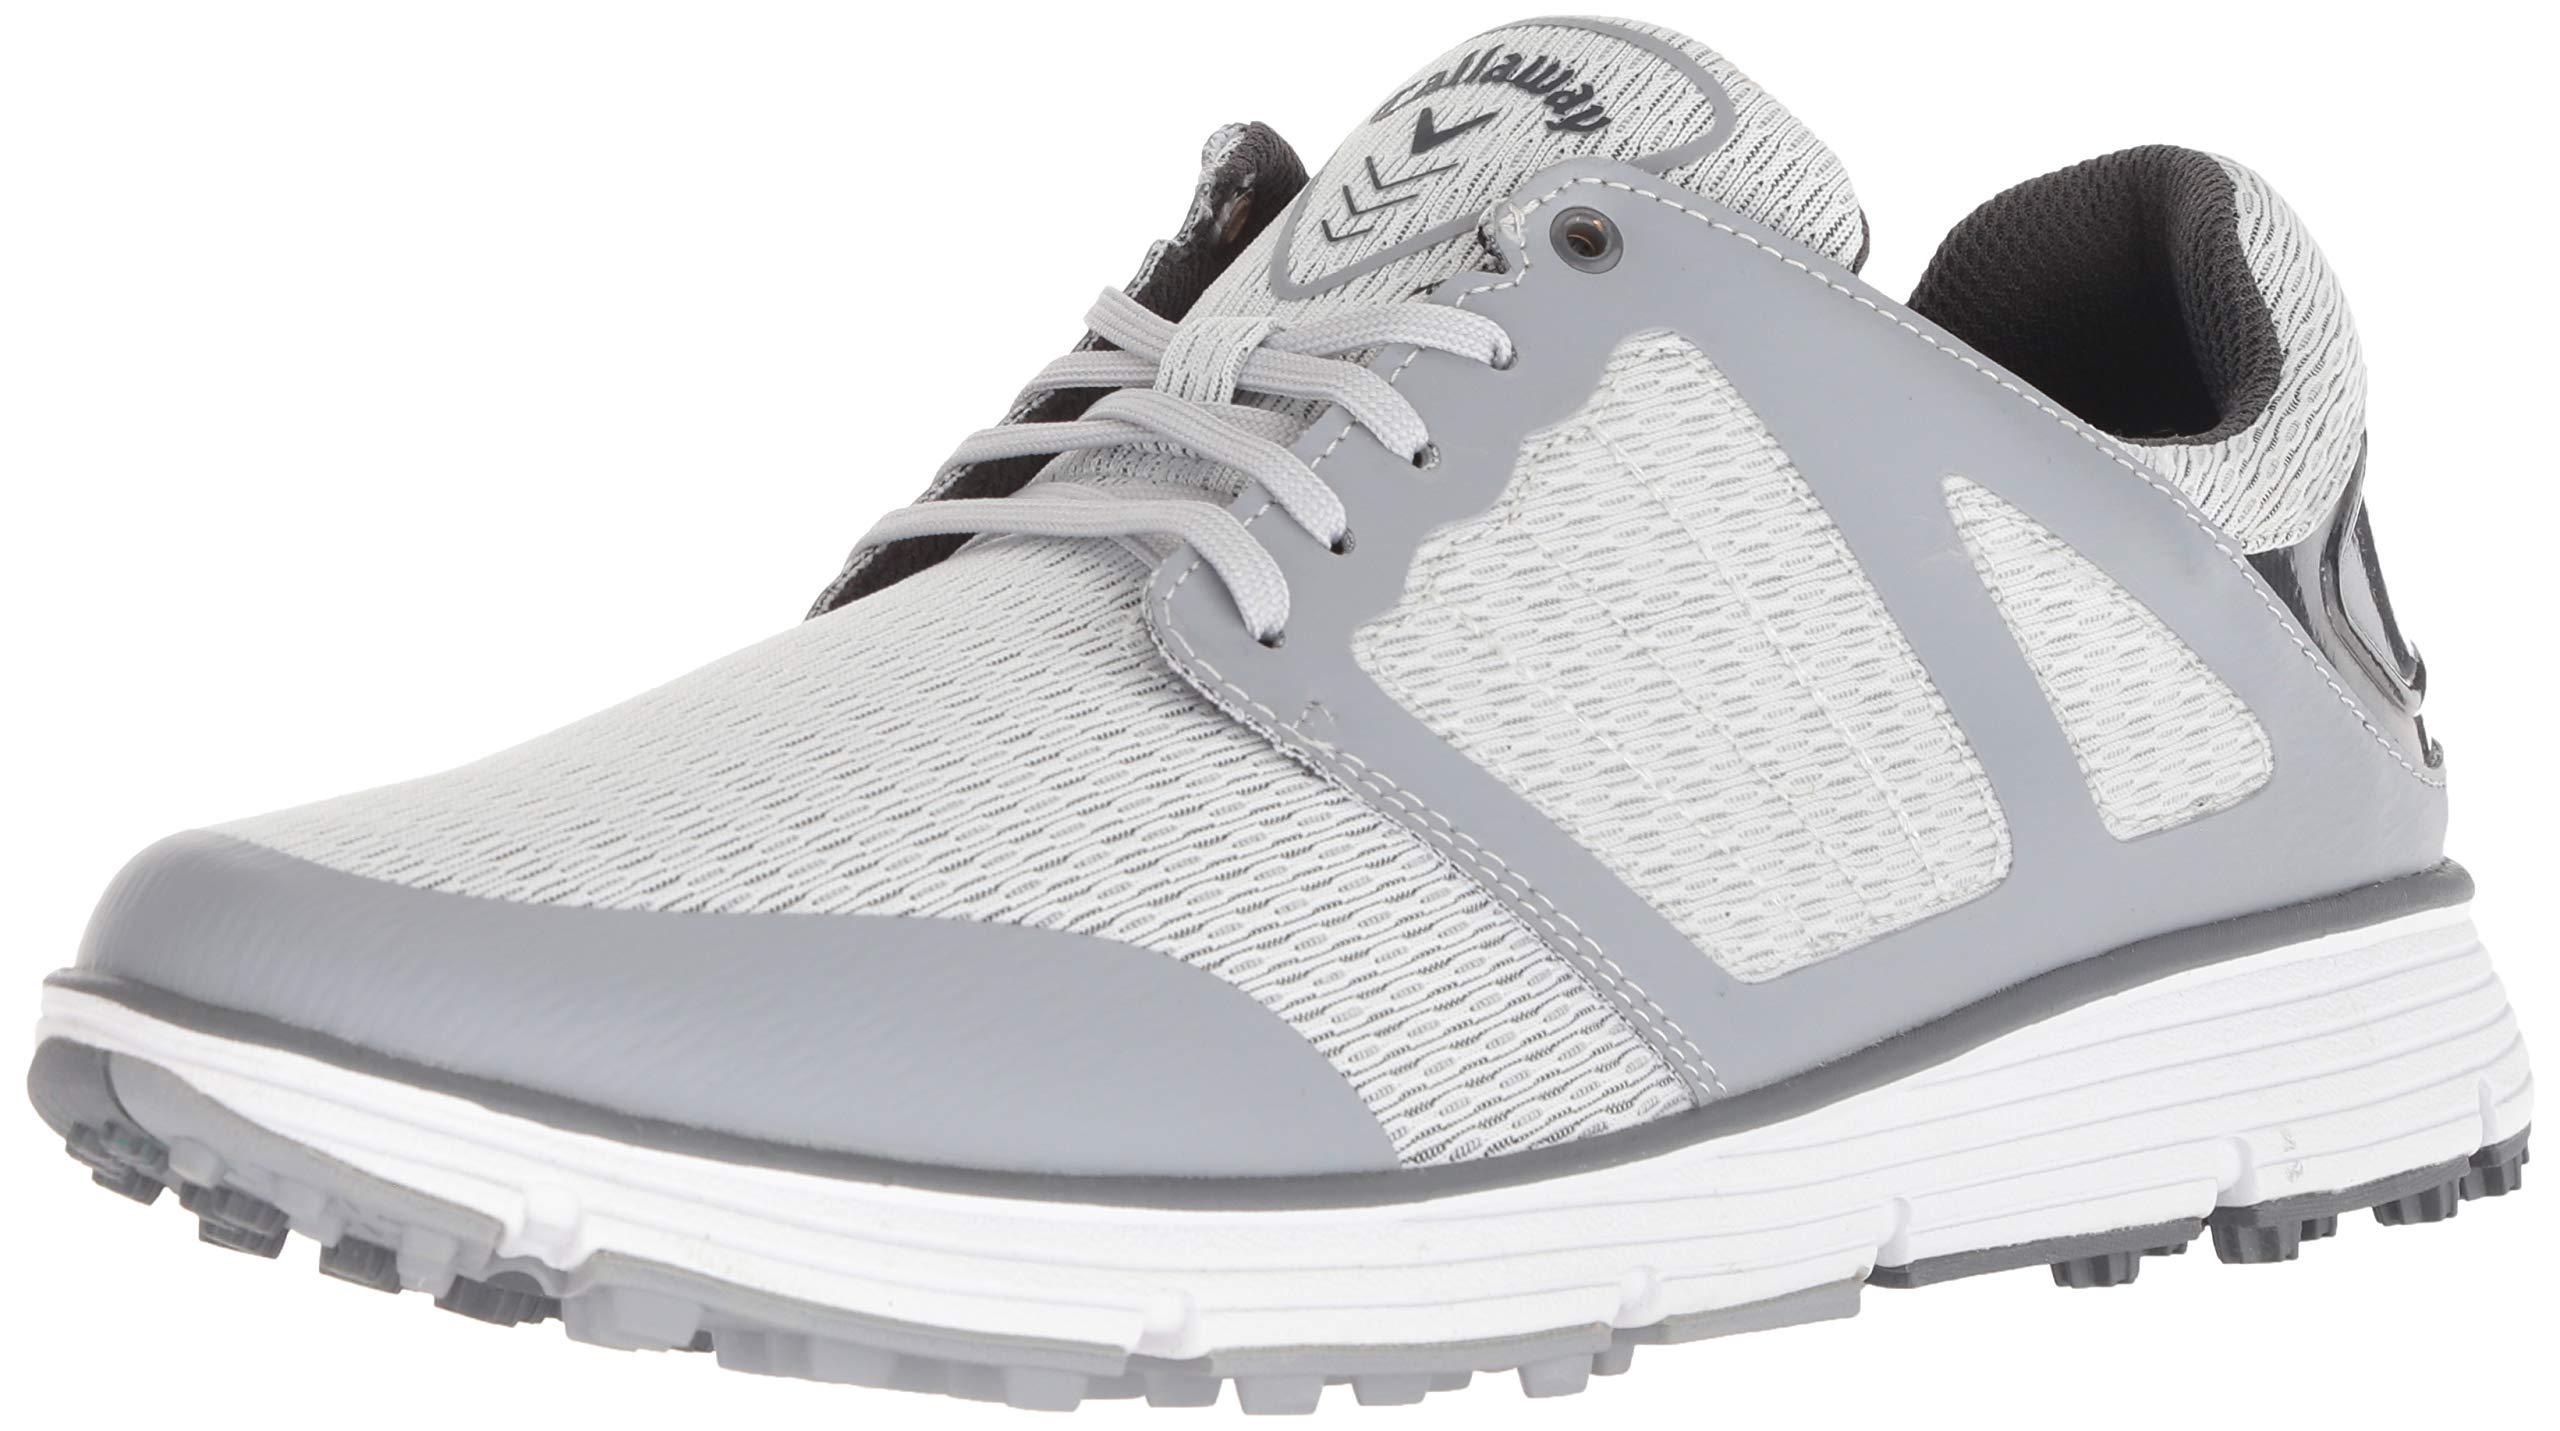 Callaway Men's Balboa Vent 2.0 Golf Shoe, Light Grey, 14 M US by Callaway